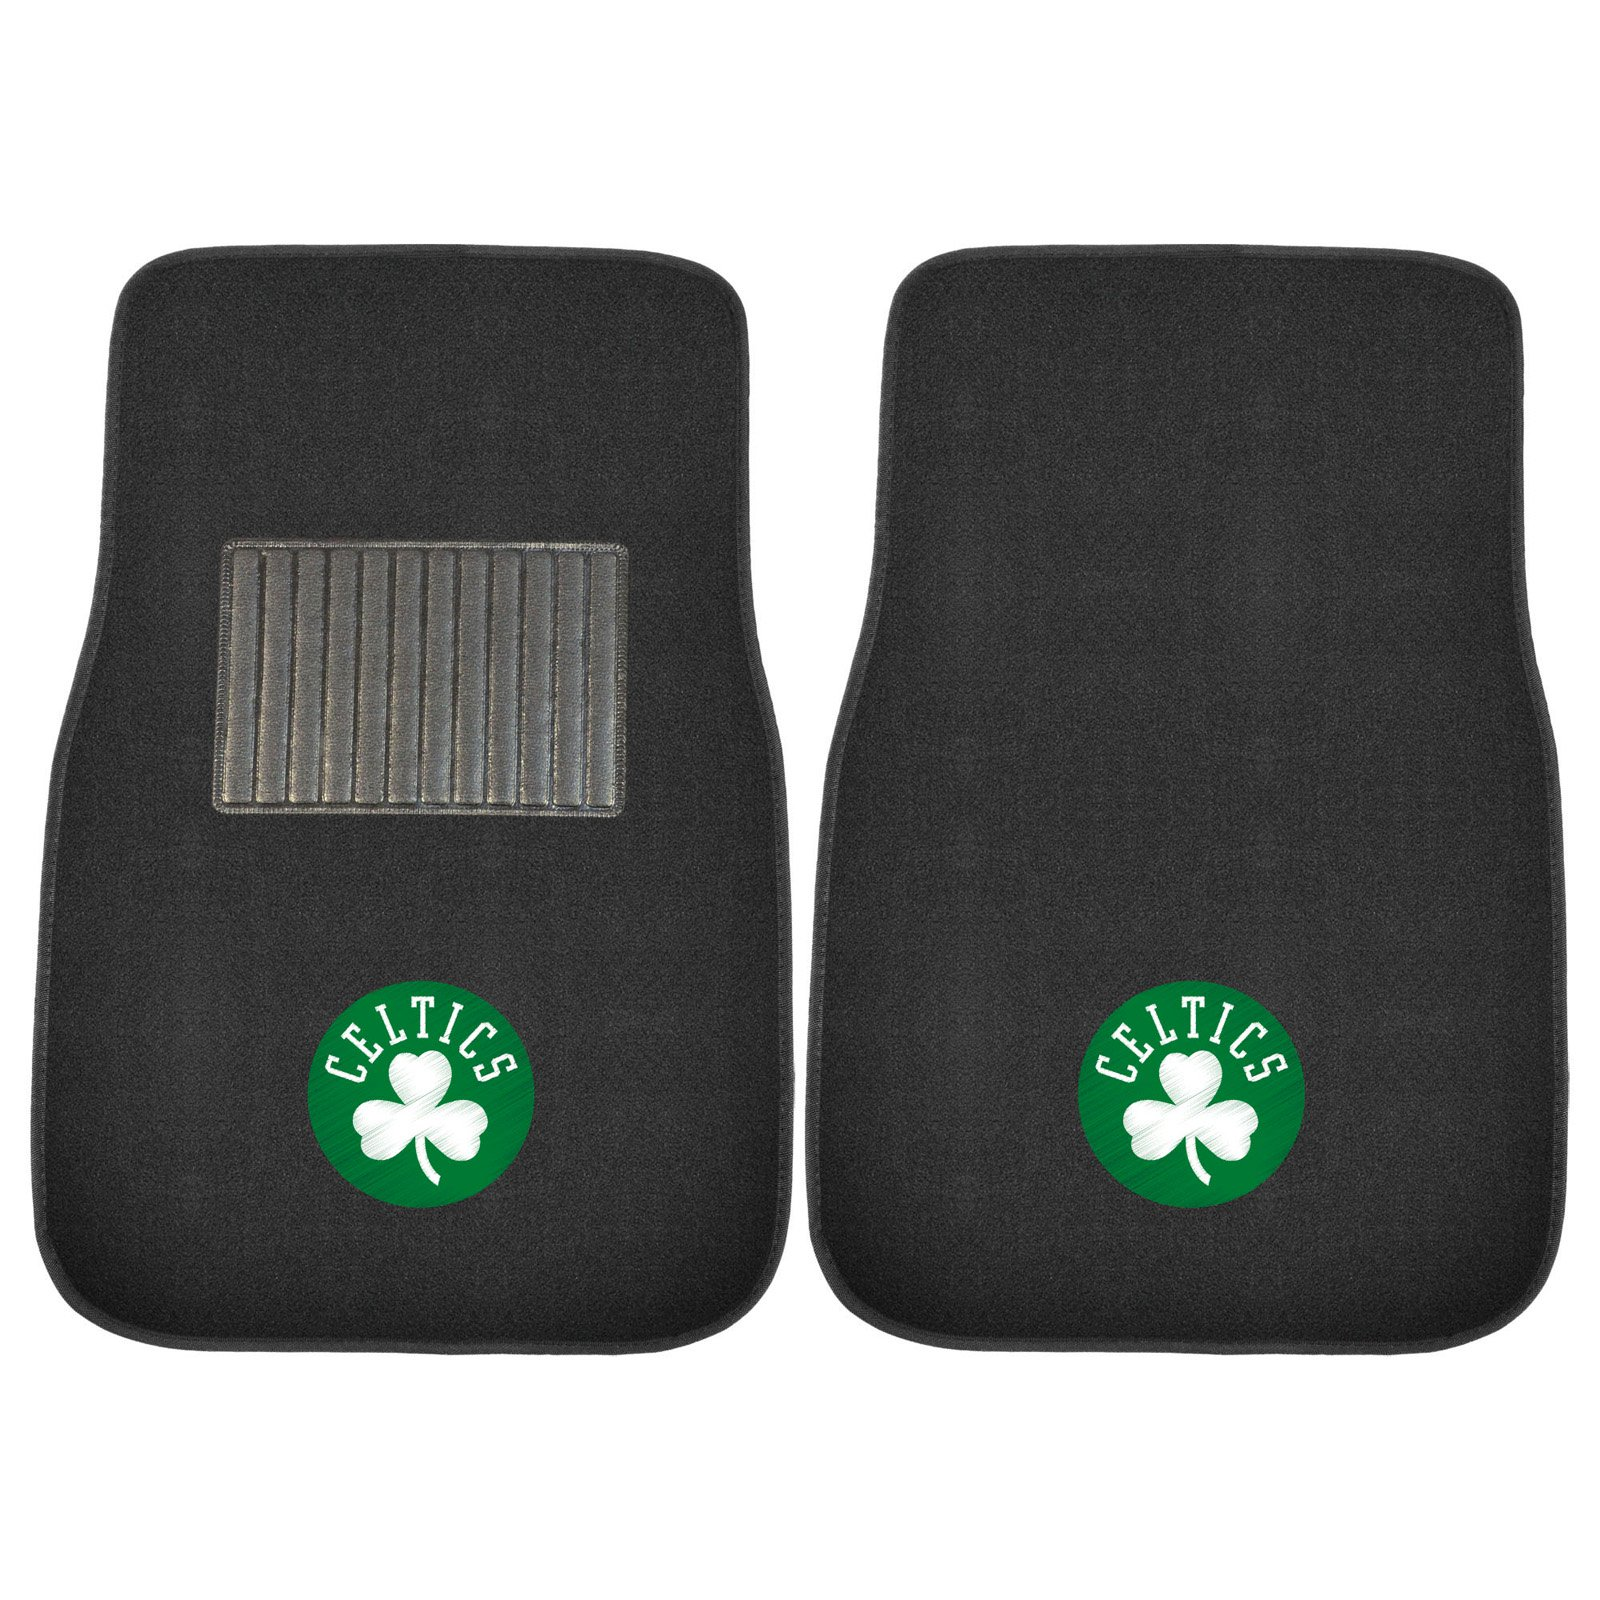 NBA Boston Celtics Embroidered Car Mats